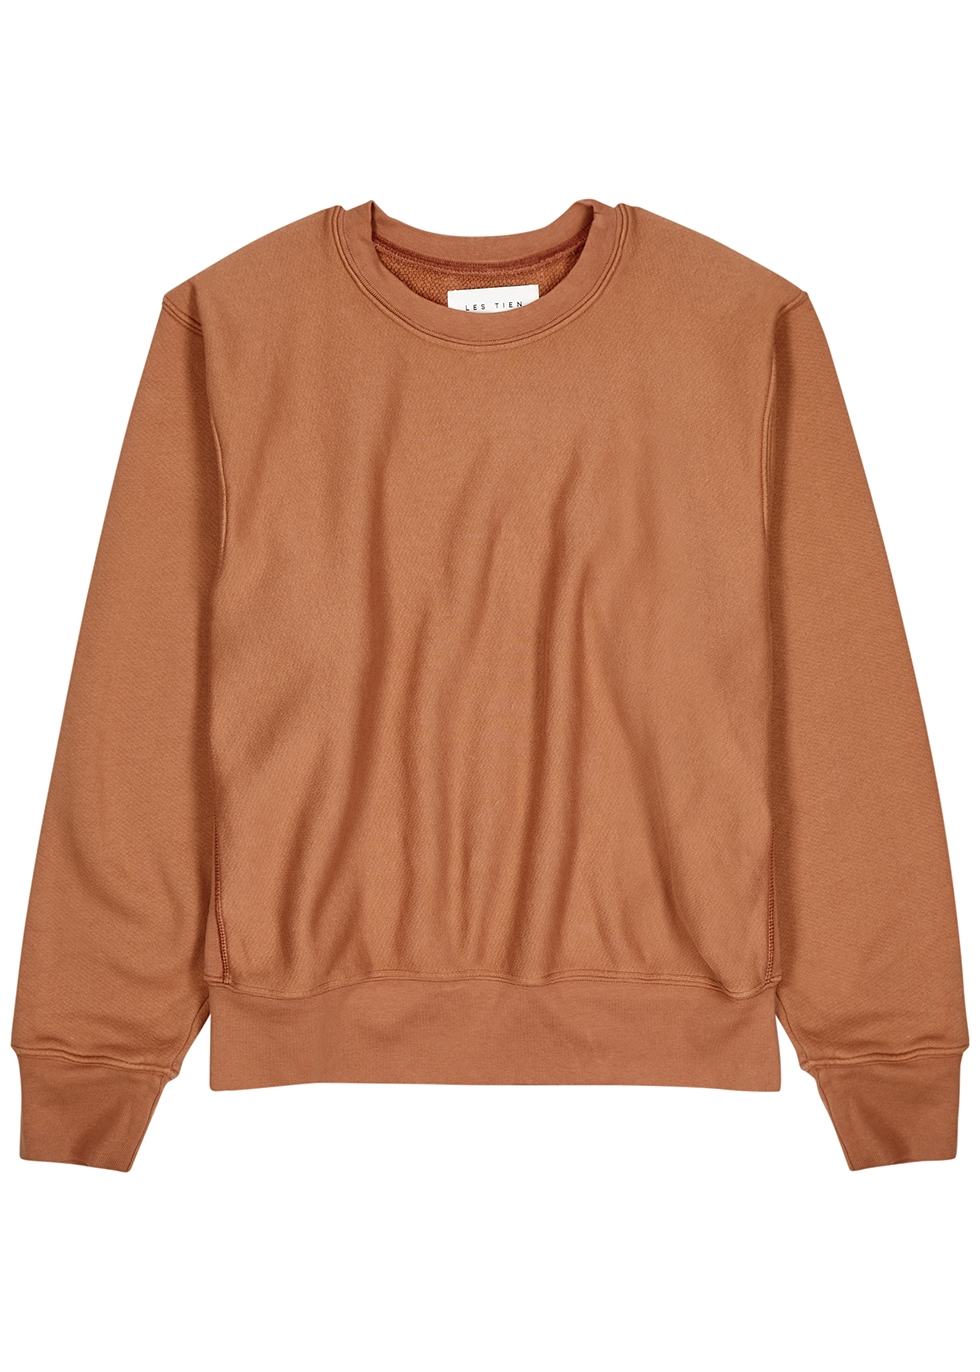 Rust cotton-jersey sweatshirt